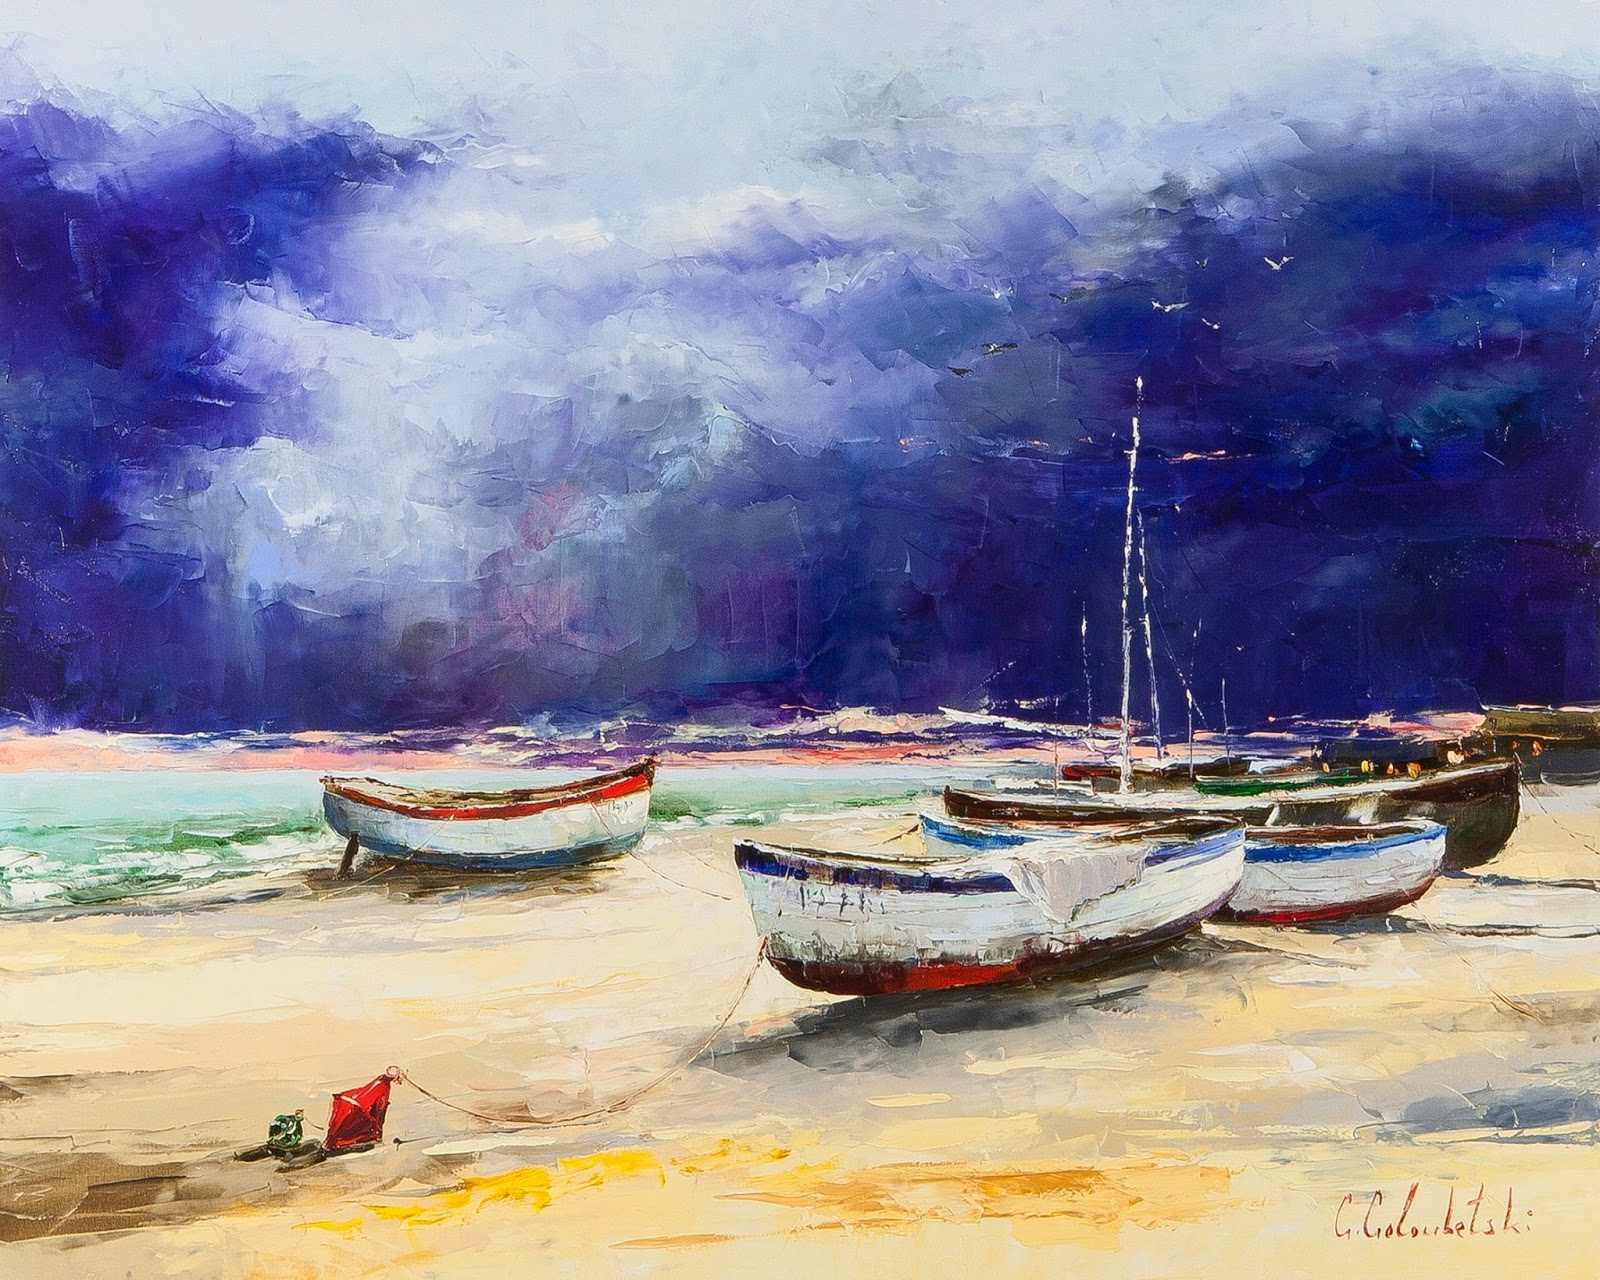 Gleb Goloubetski Fishing boats